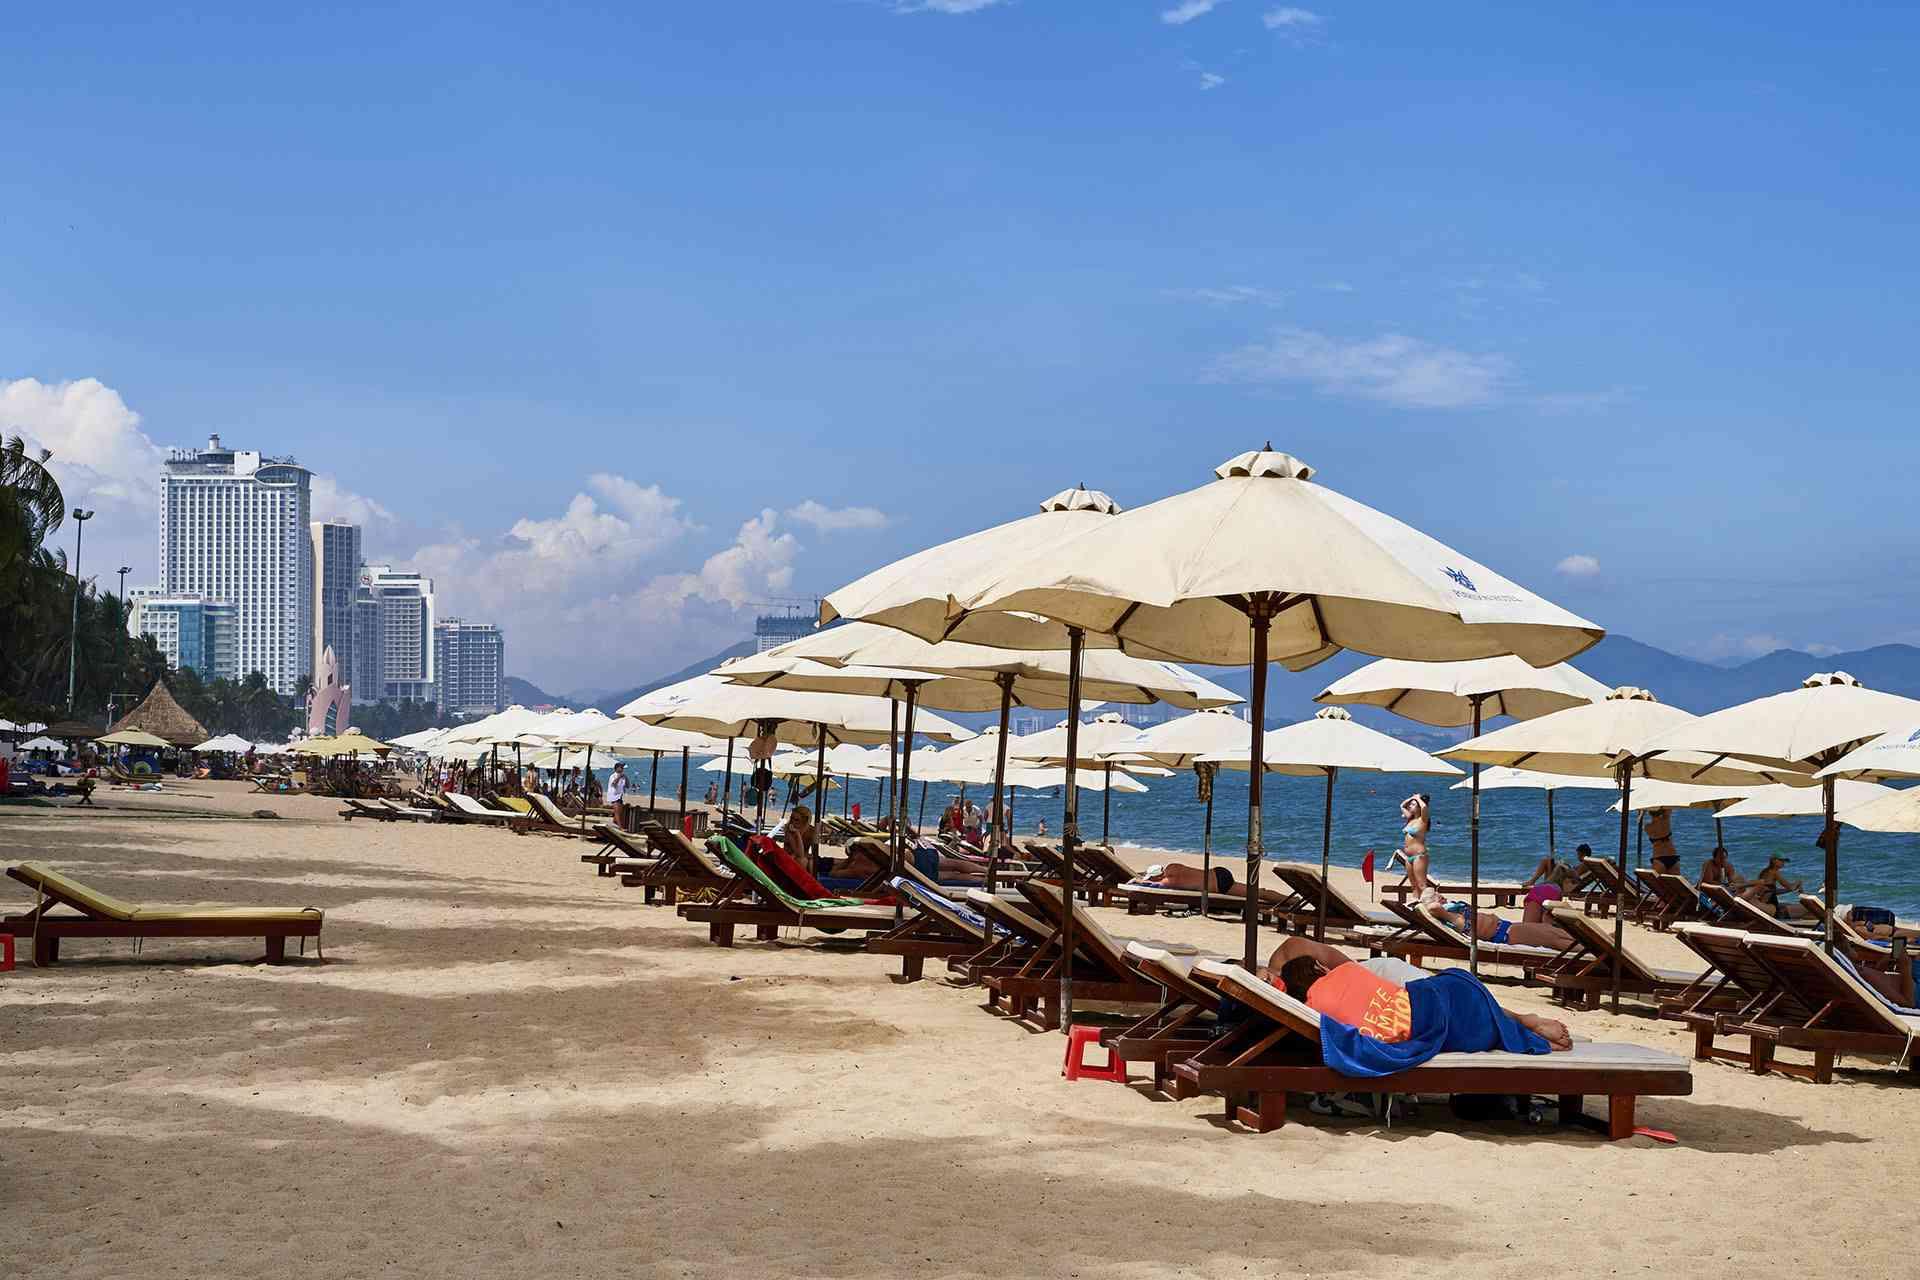 The Best Beaches in Vietnam